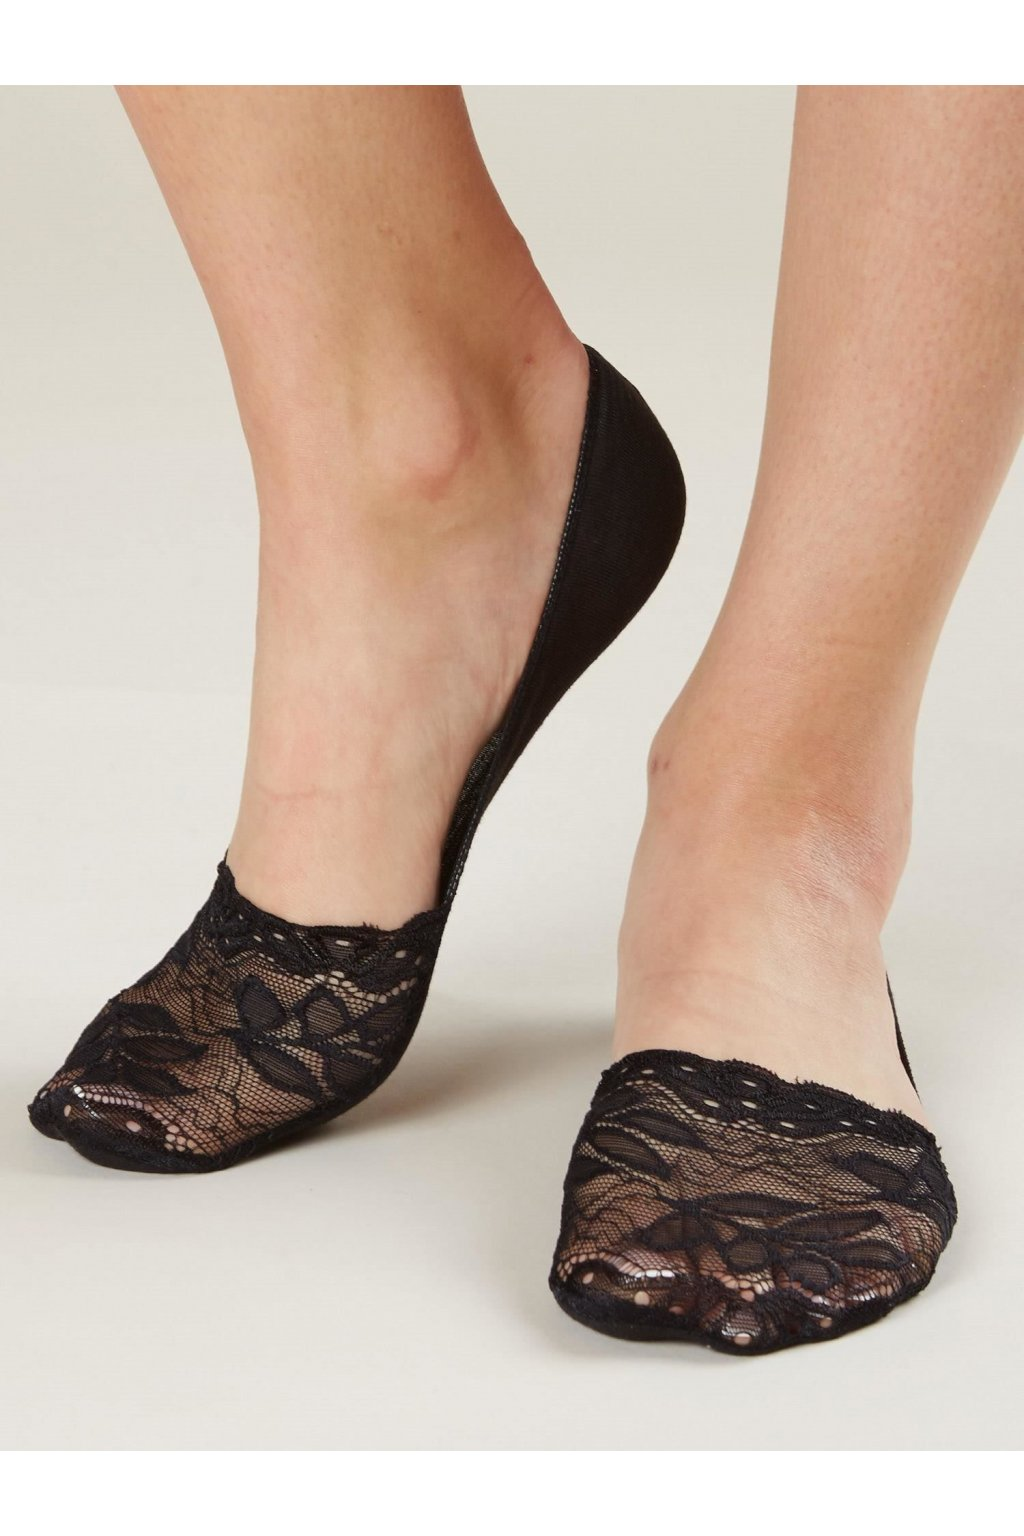 Dámske ponožky kód 7-SR-WSWC030(2)